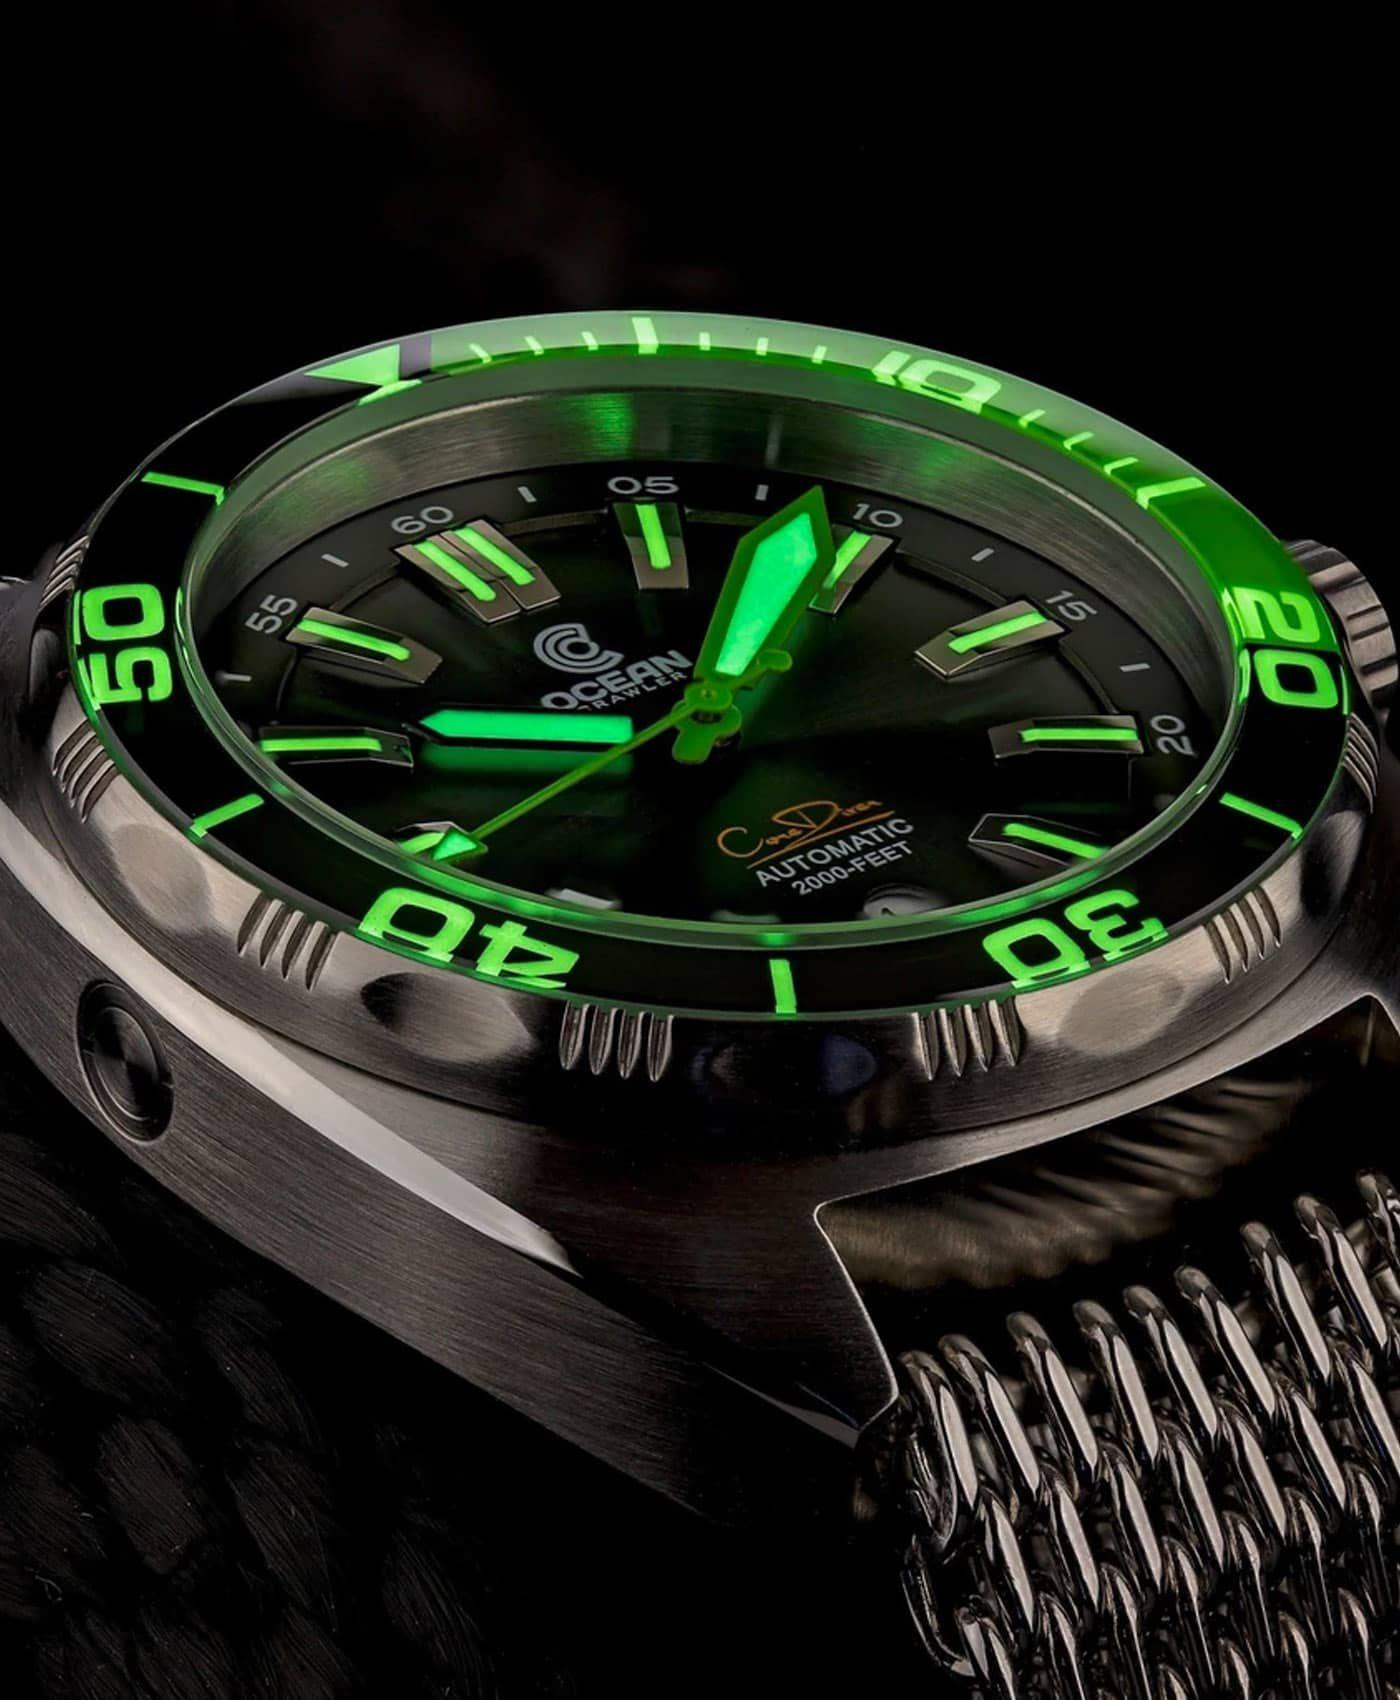 Ocean Crawler Core Diver Green Black v3 lume shot